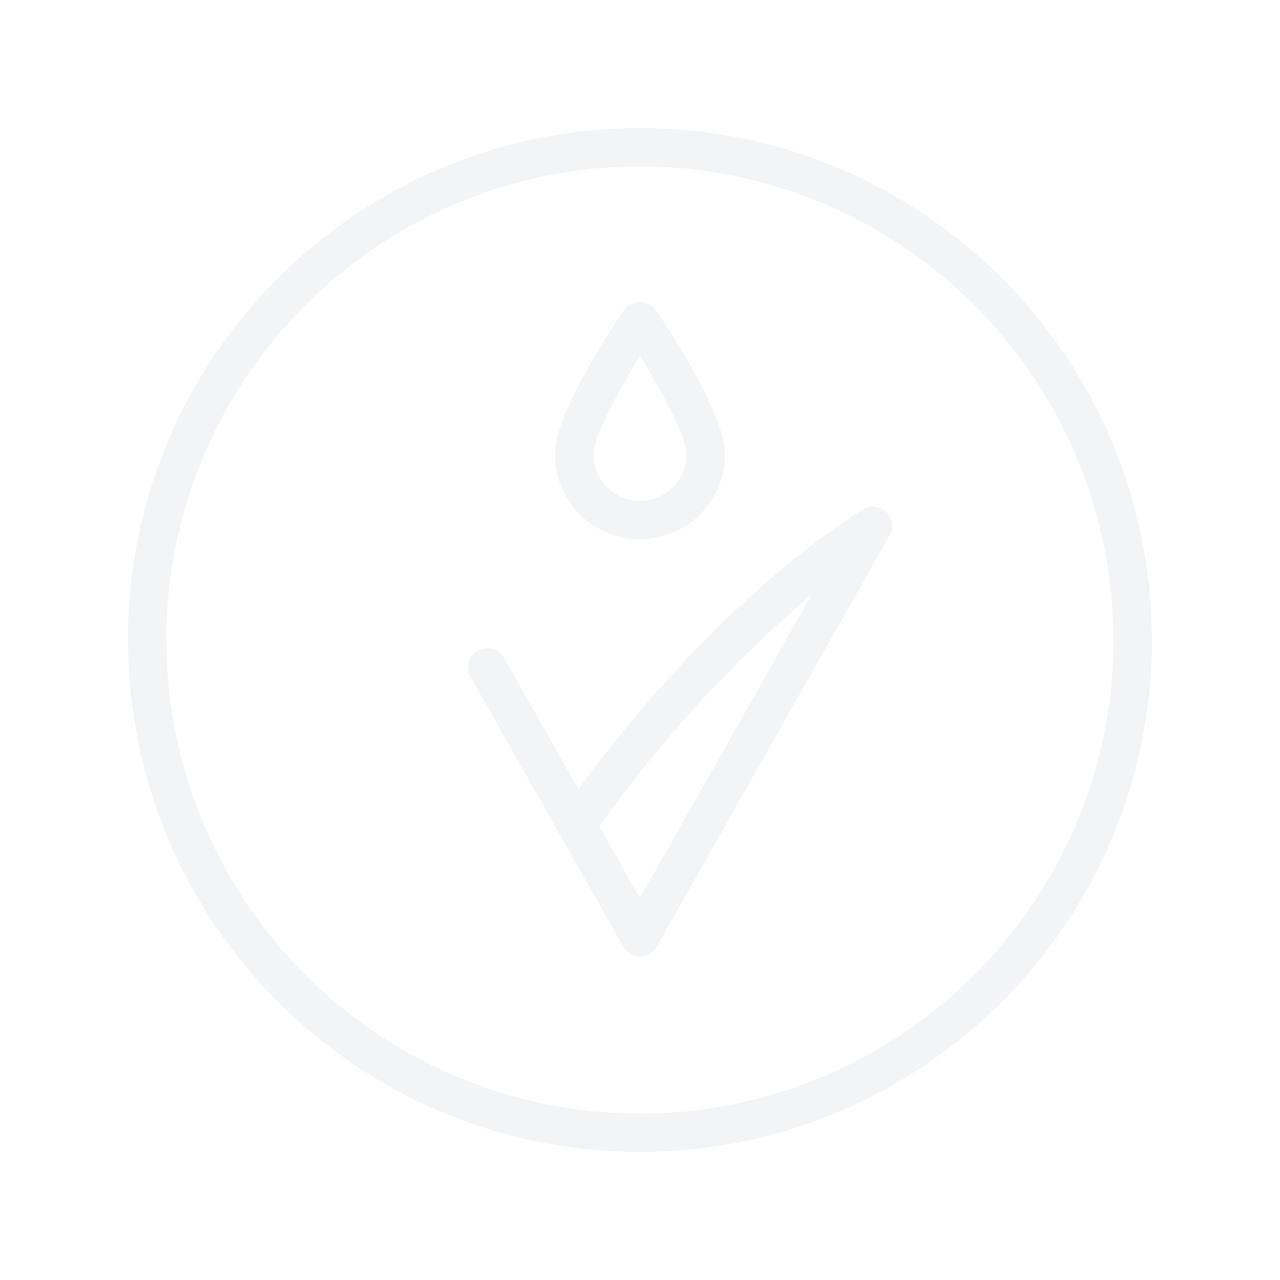 MISSHA Near Skin Trouble Cut Calming Cream 50ml